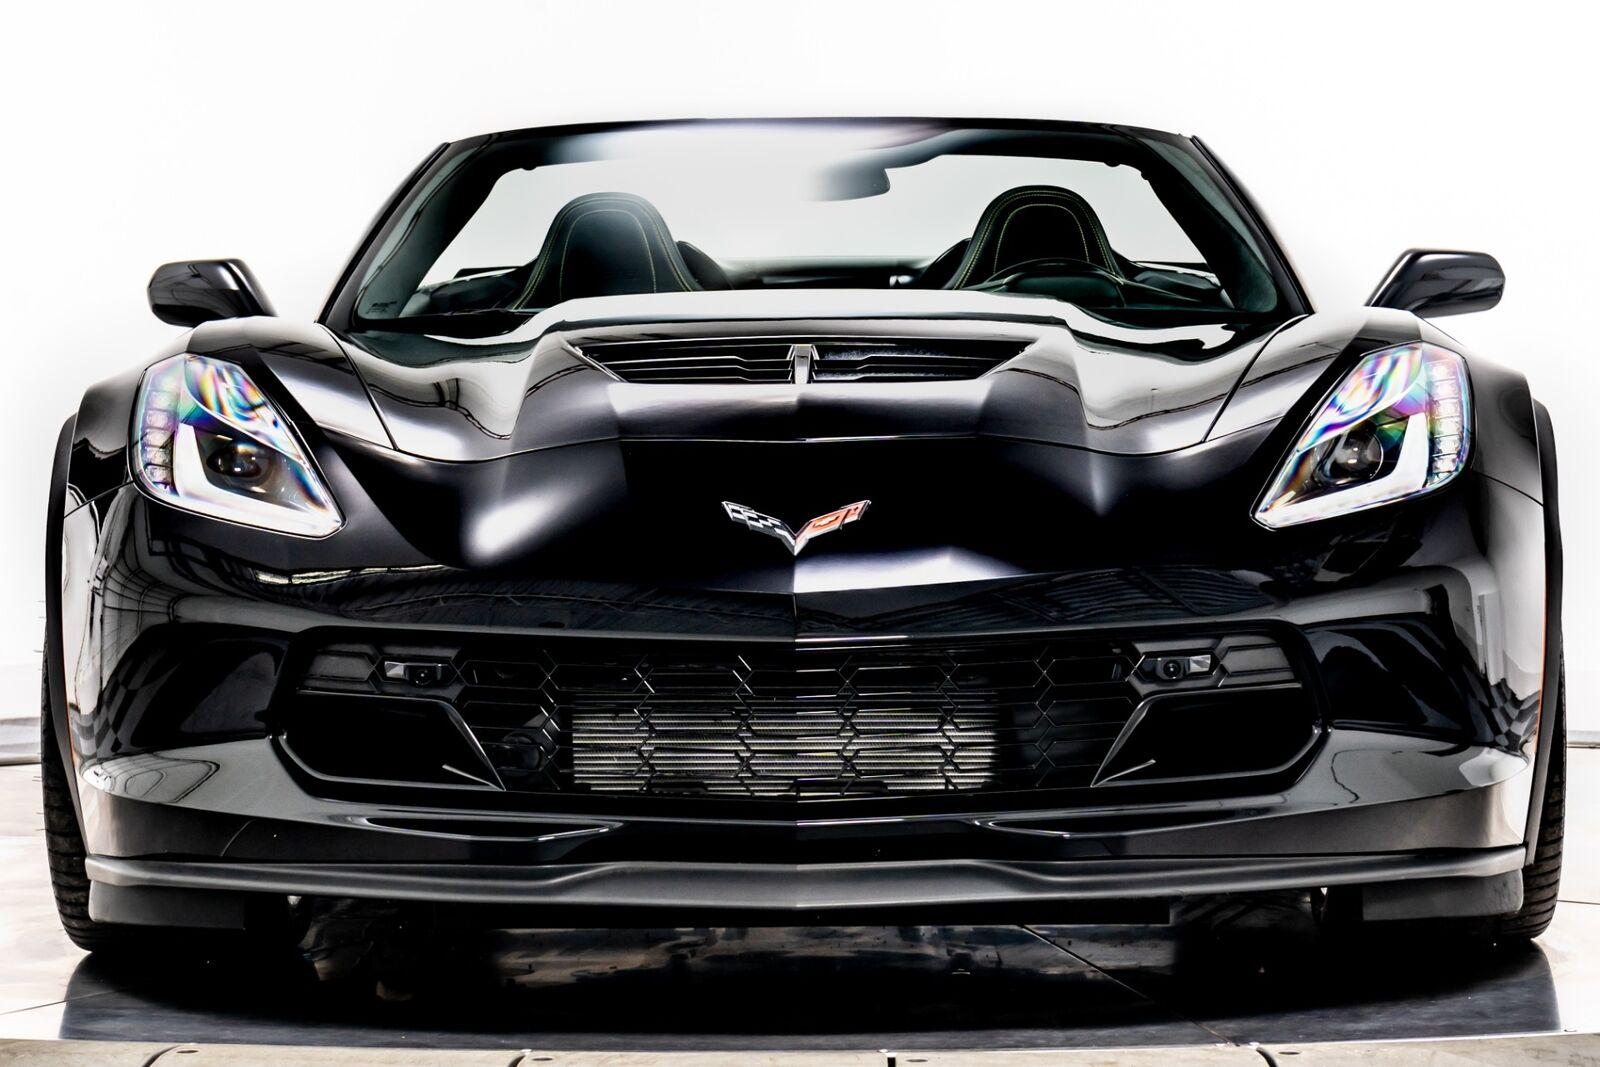 2018 Black Chevrolet Corvette Z06 3LZ   C7 Corvette Photo 3